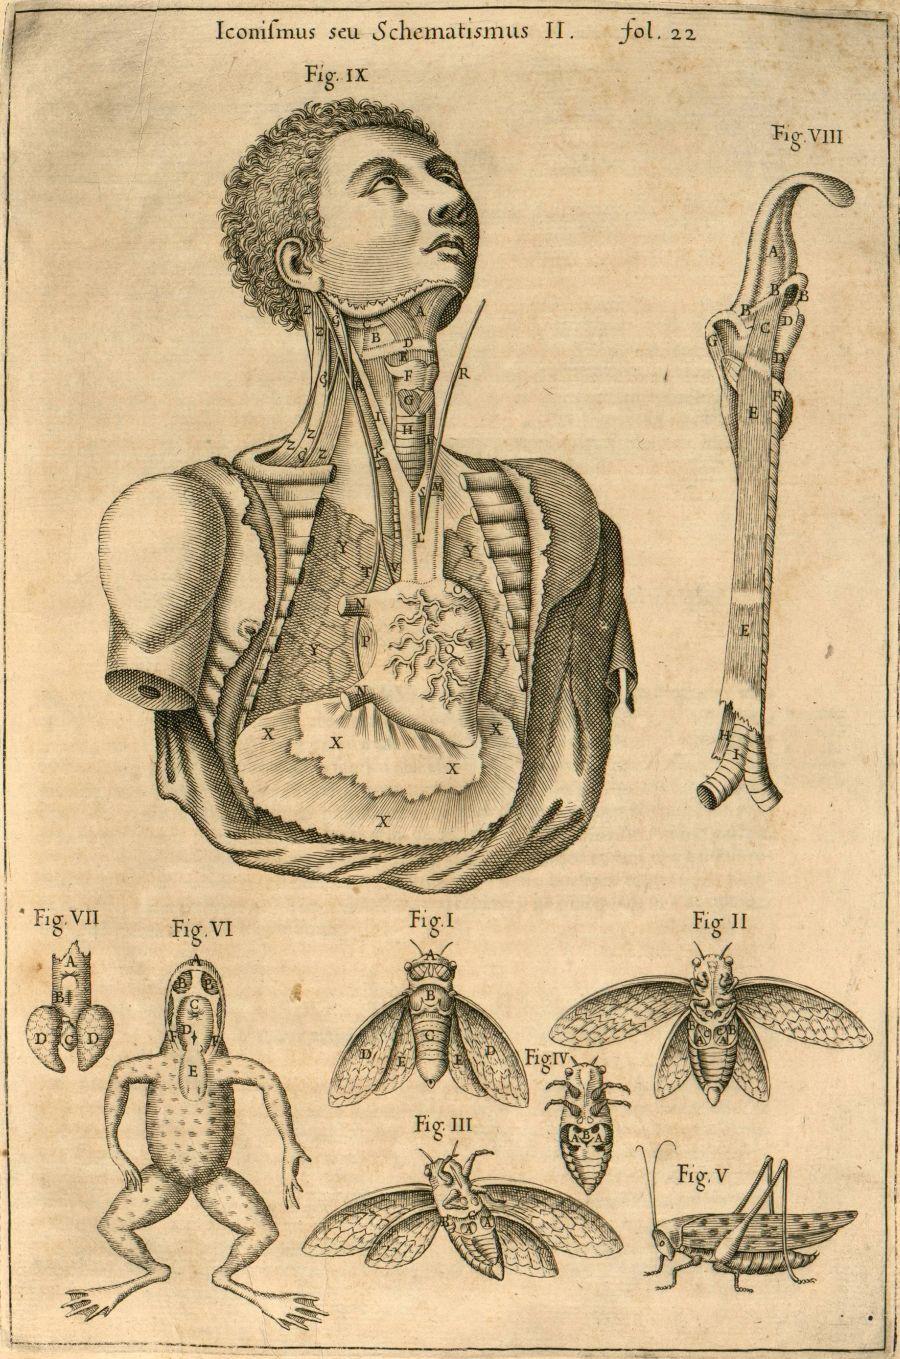 Athanasius Kircher: Musurgia larynx/thorax - comparative anatomy ...